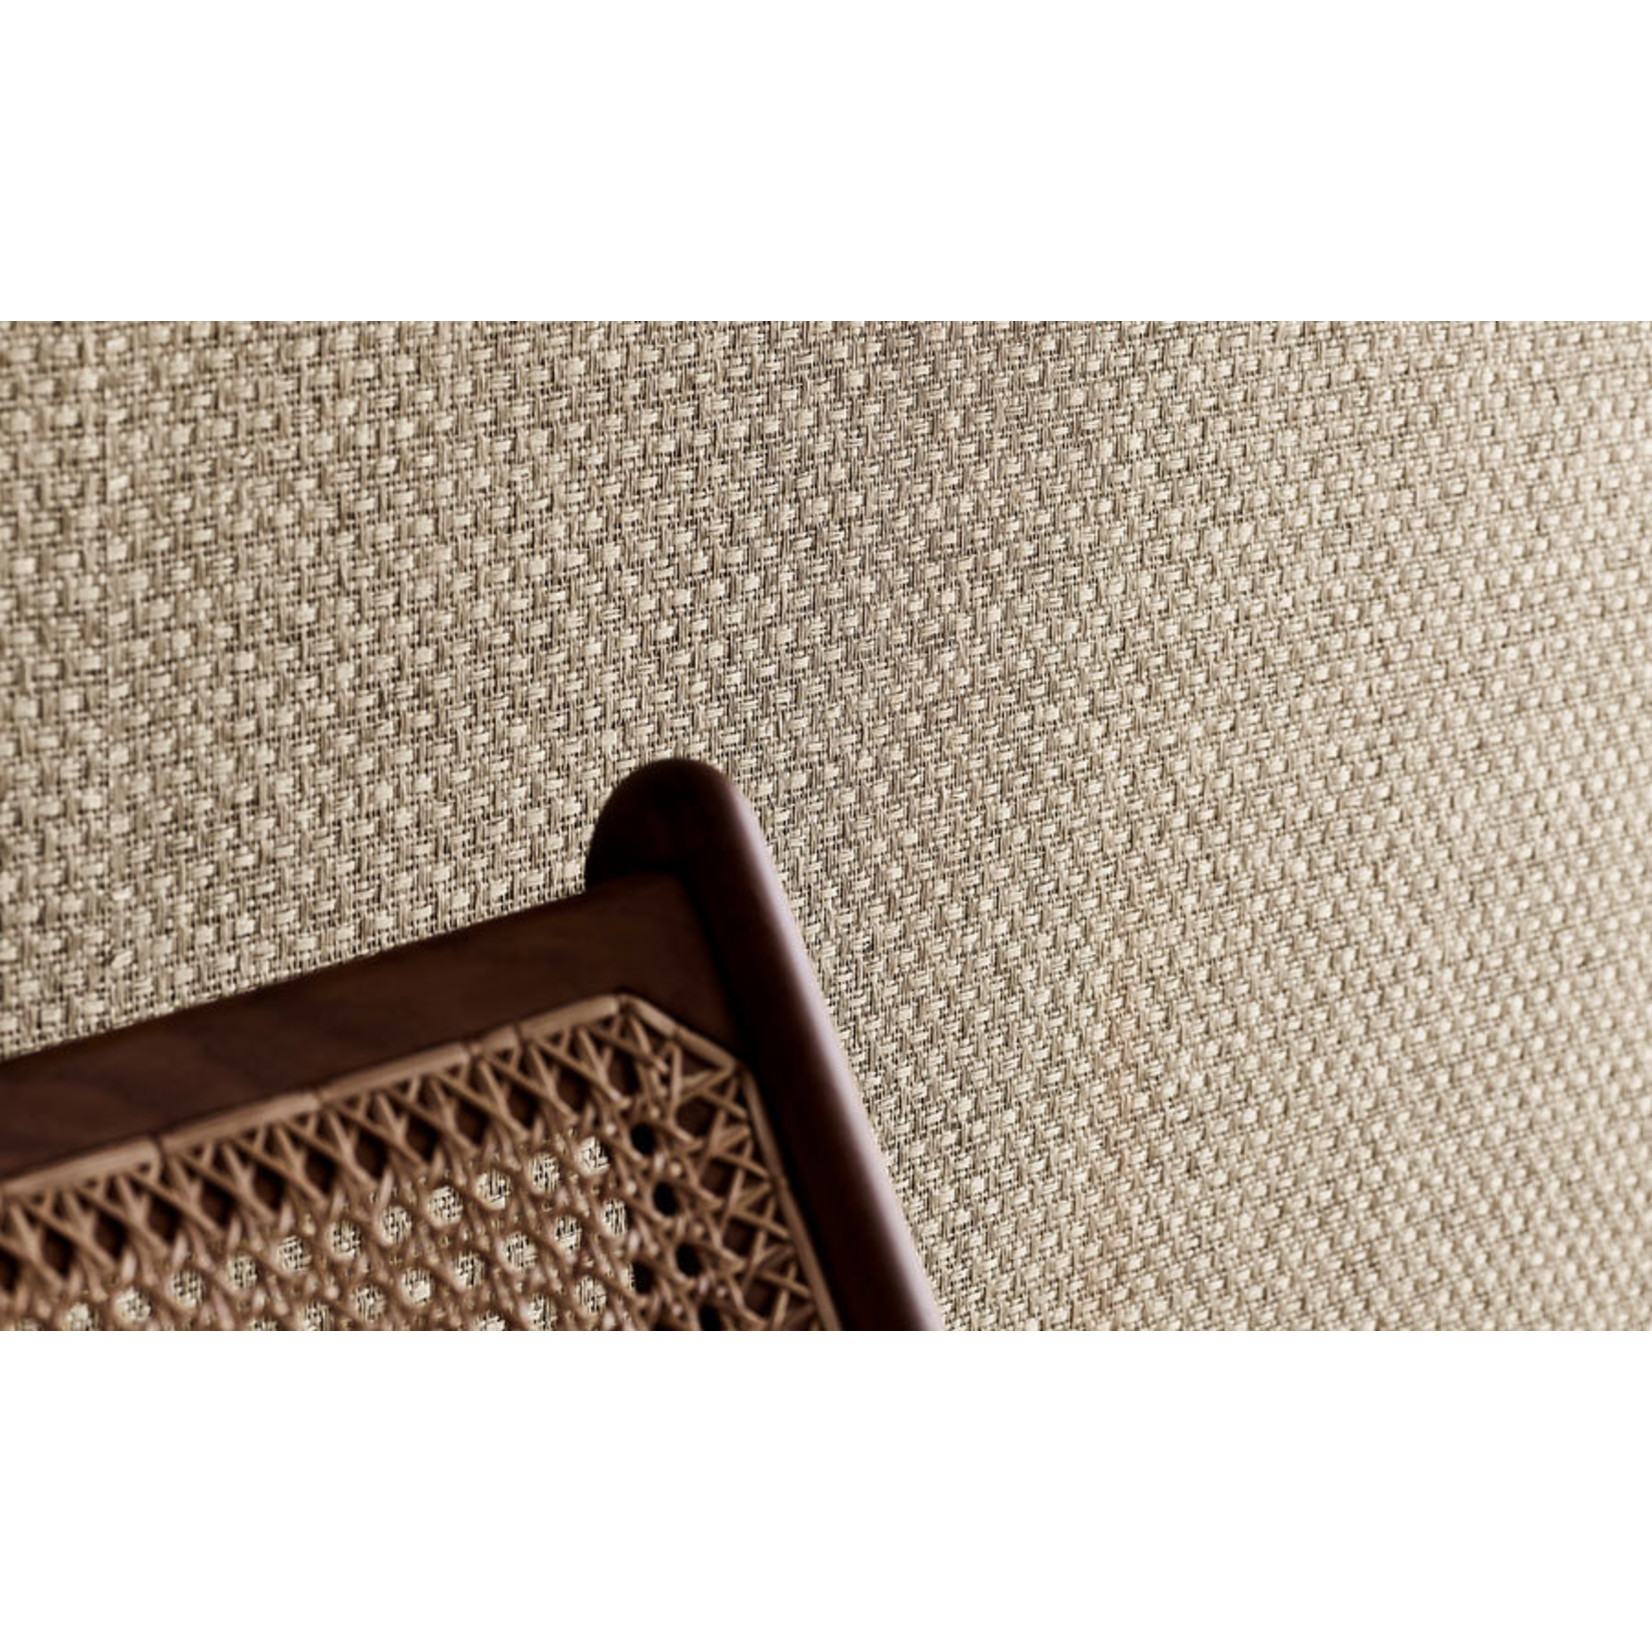 Mark Alexander Paperweave Handwoven Wallcoverings | Shifu Atlantic